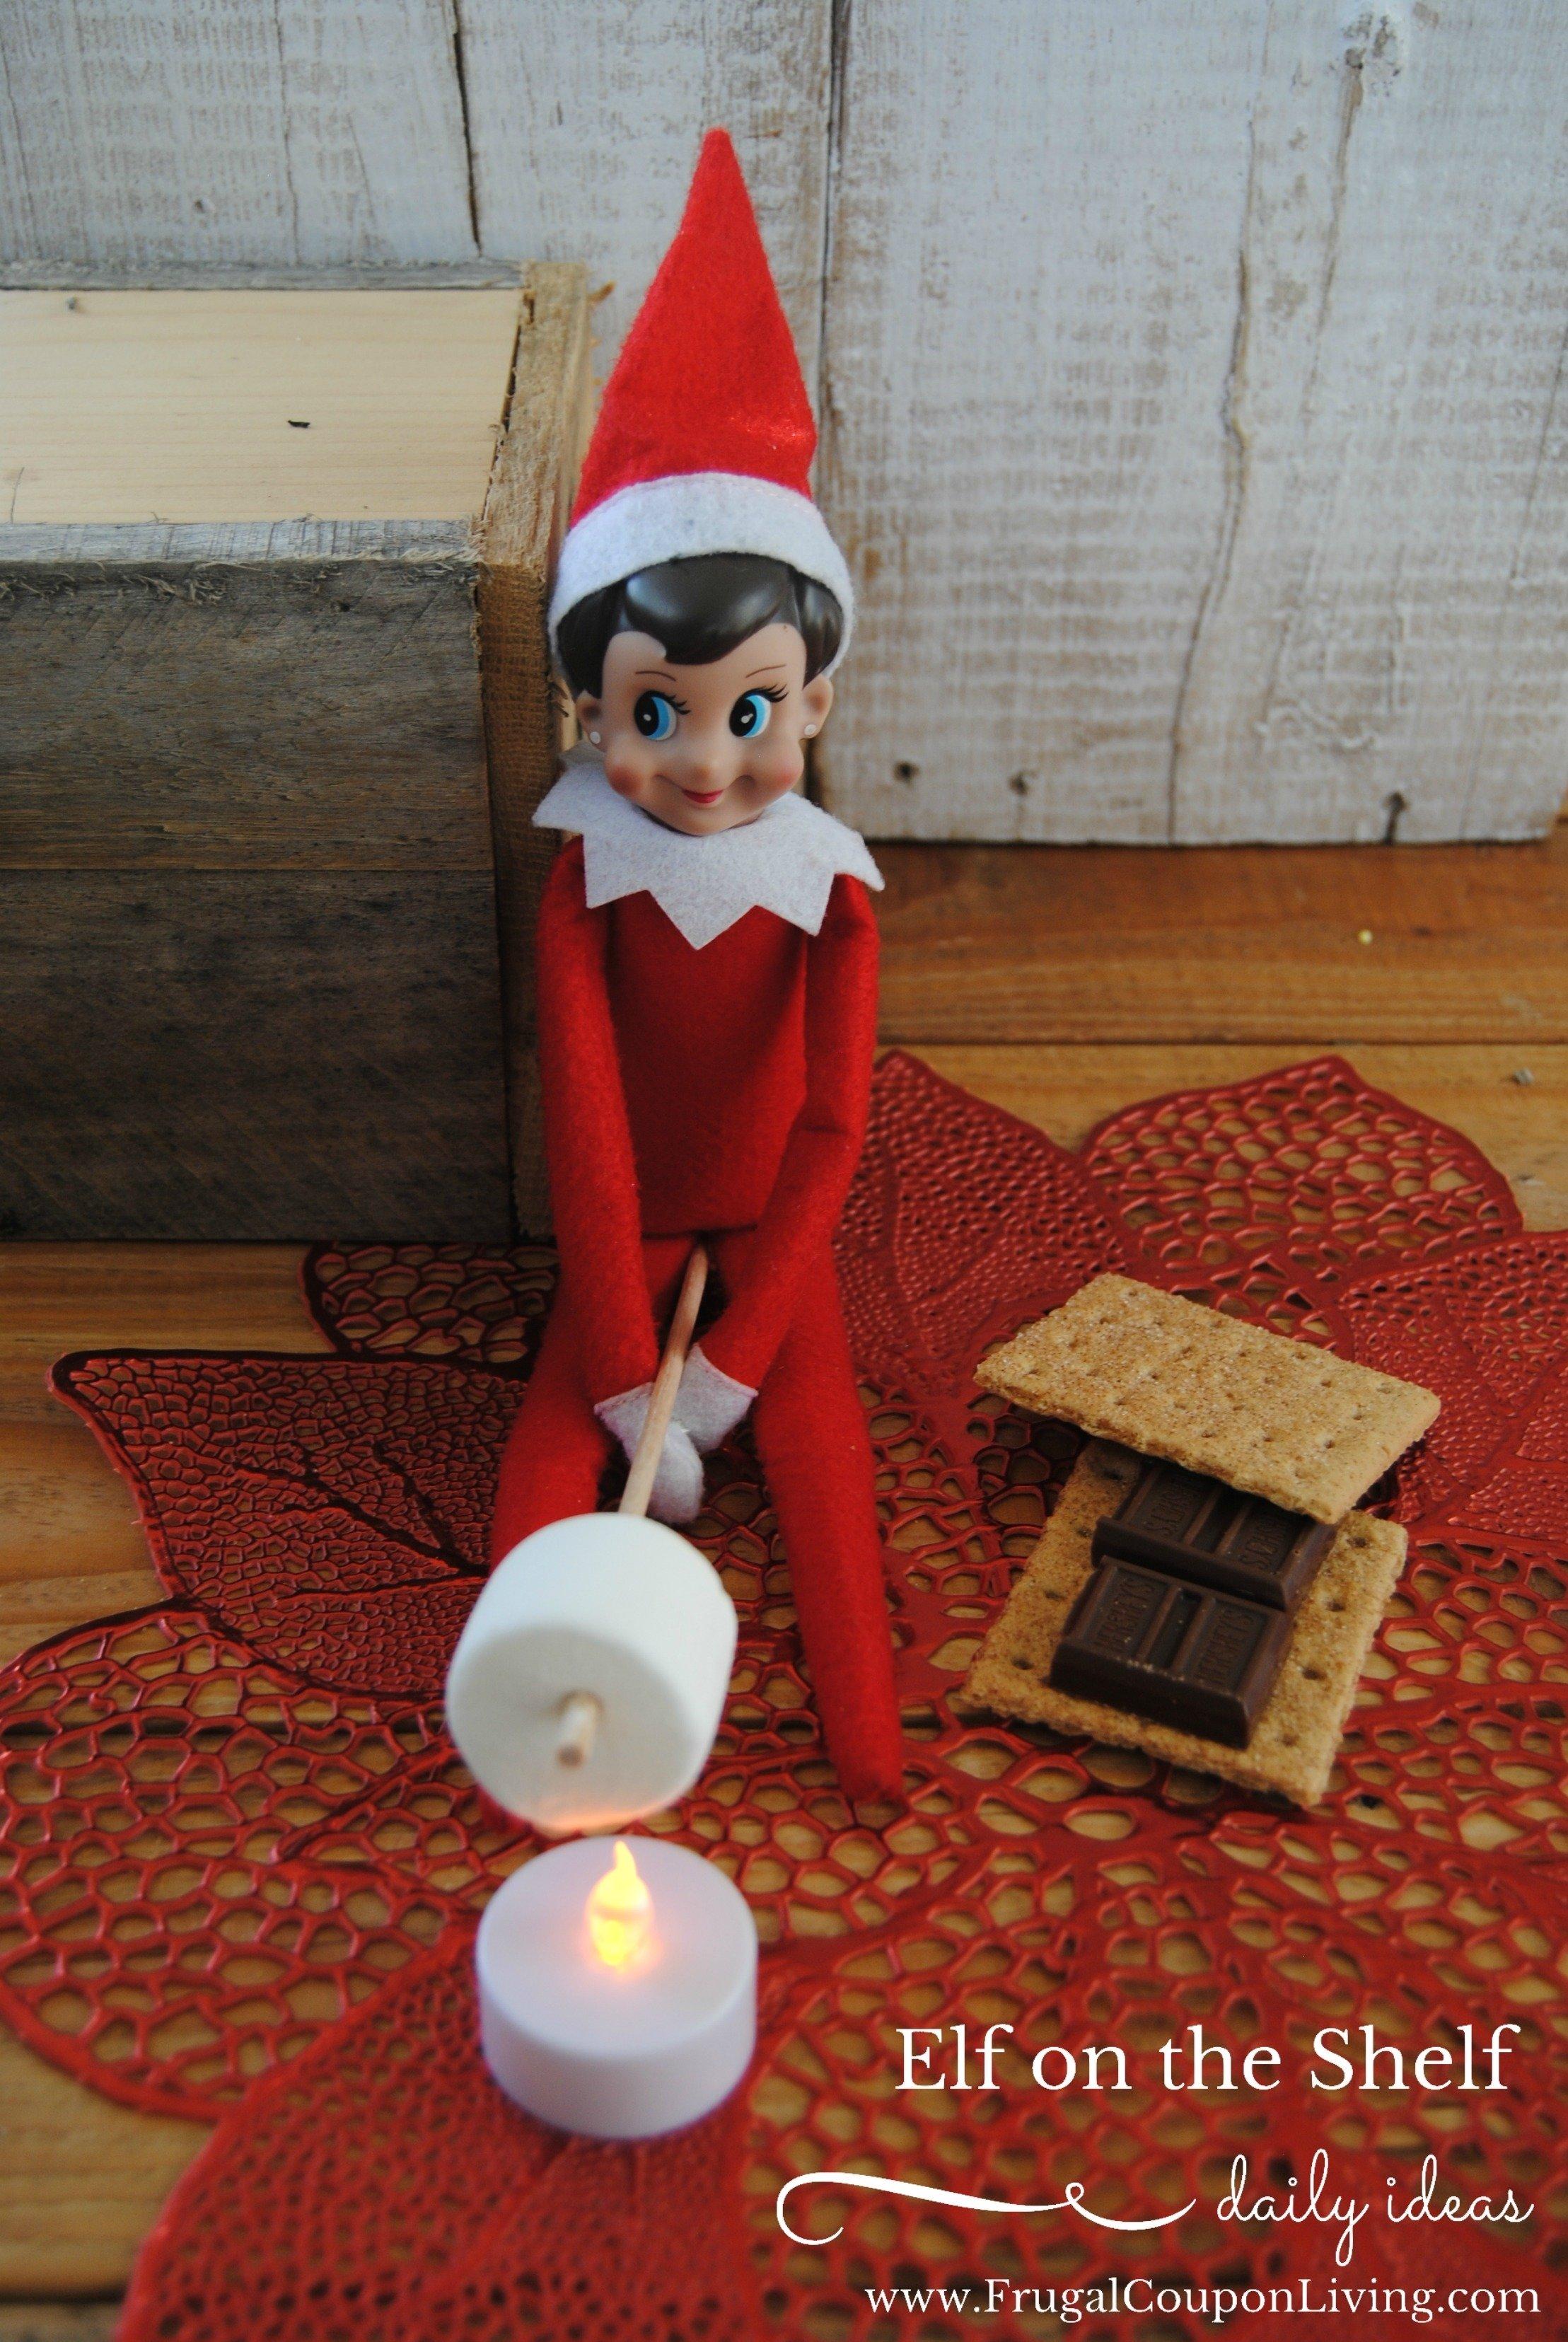 10 Cute Cool Ideas For Elf On The Shelf elf on the shelf ideas elf makes smores 4 2020